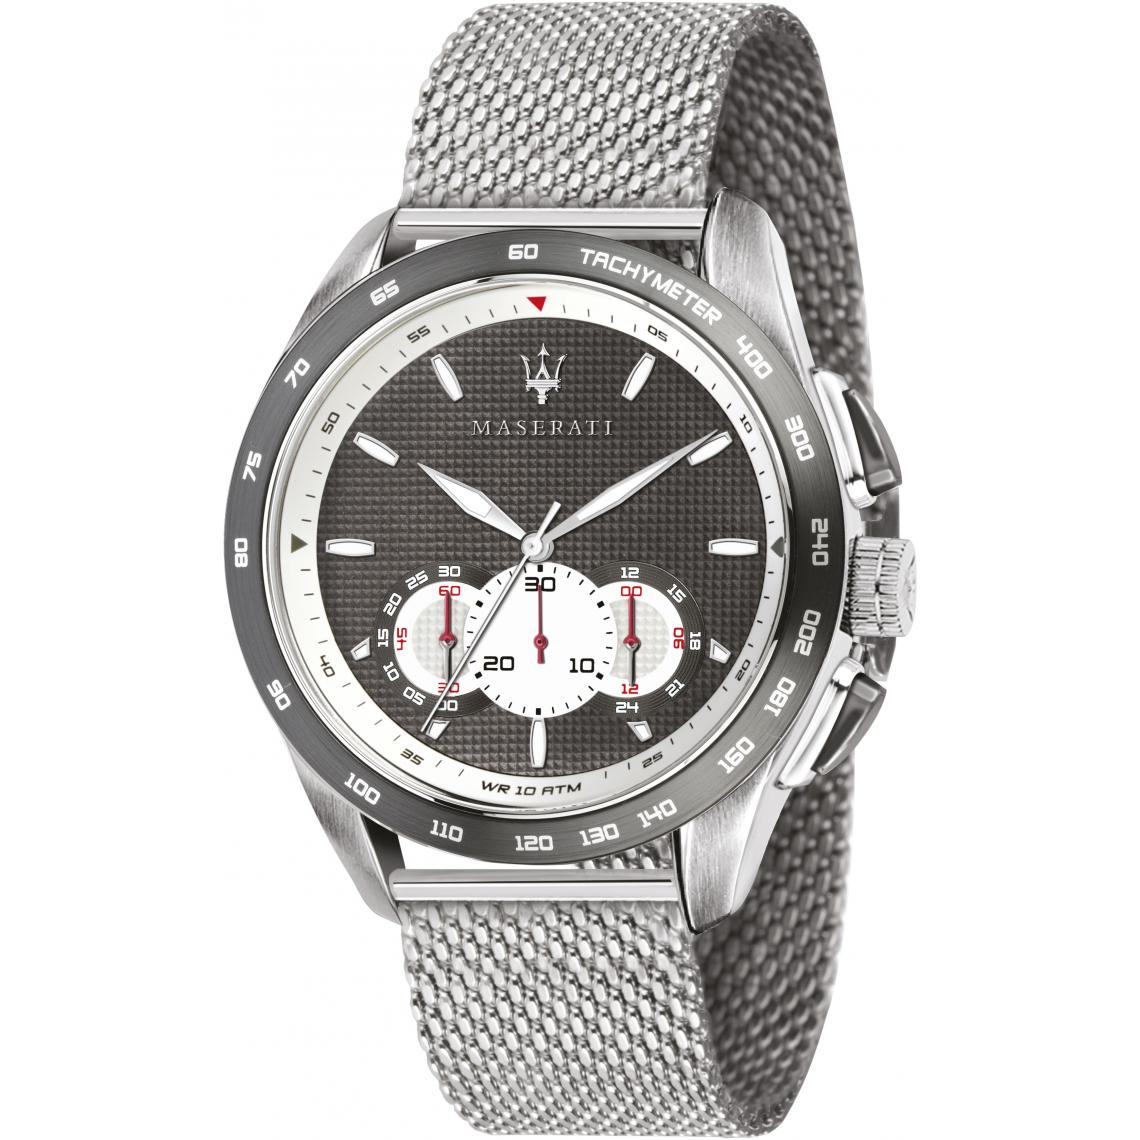 Montre Maserati TRAGUARDO - Montre Chronographe AcierMaserati - R8873612008 - Modalova